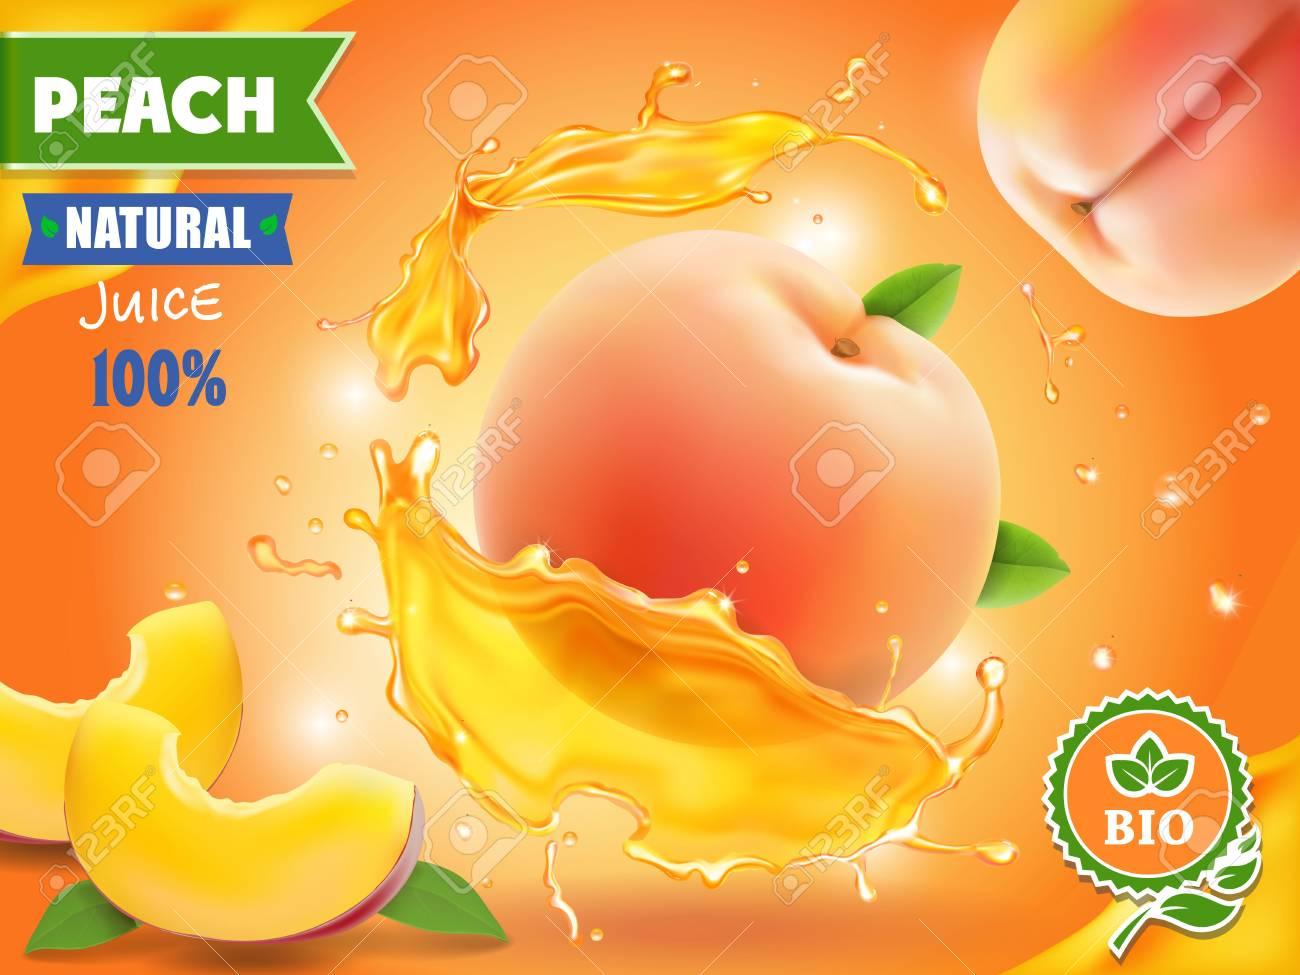 Peach juice. Realistic splash of juice with peach advertising. - 92149007